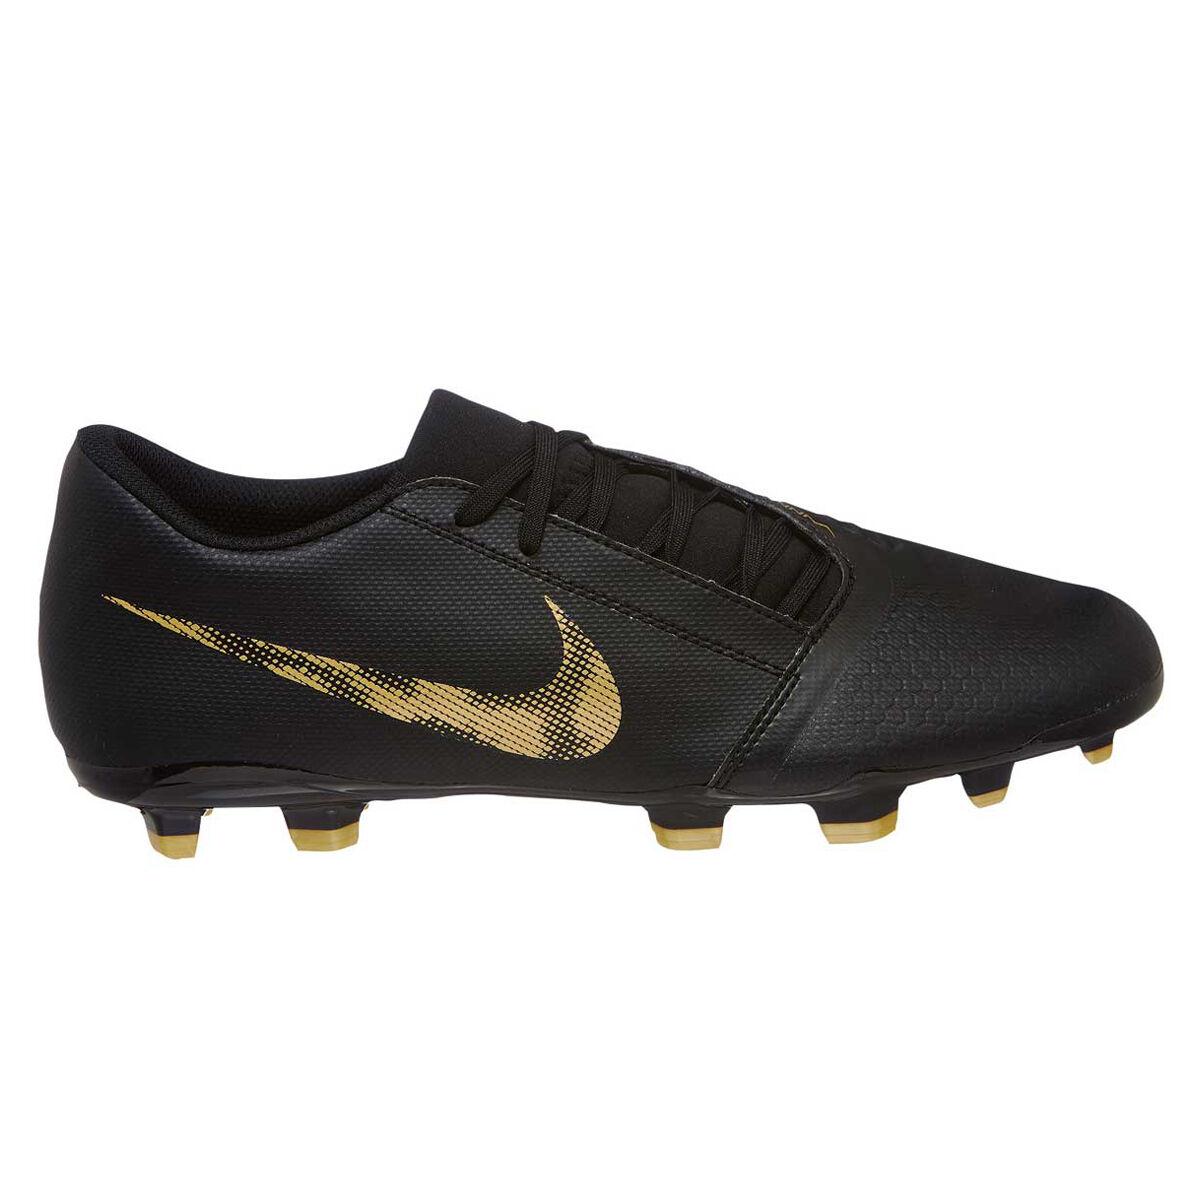 Nike Phantom Venom Academy Mens Football Boots Rebel